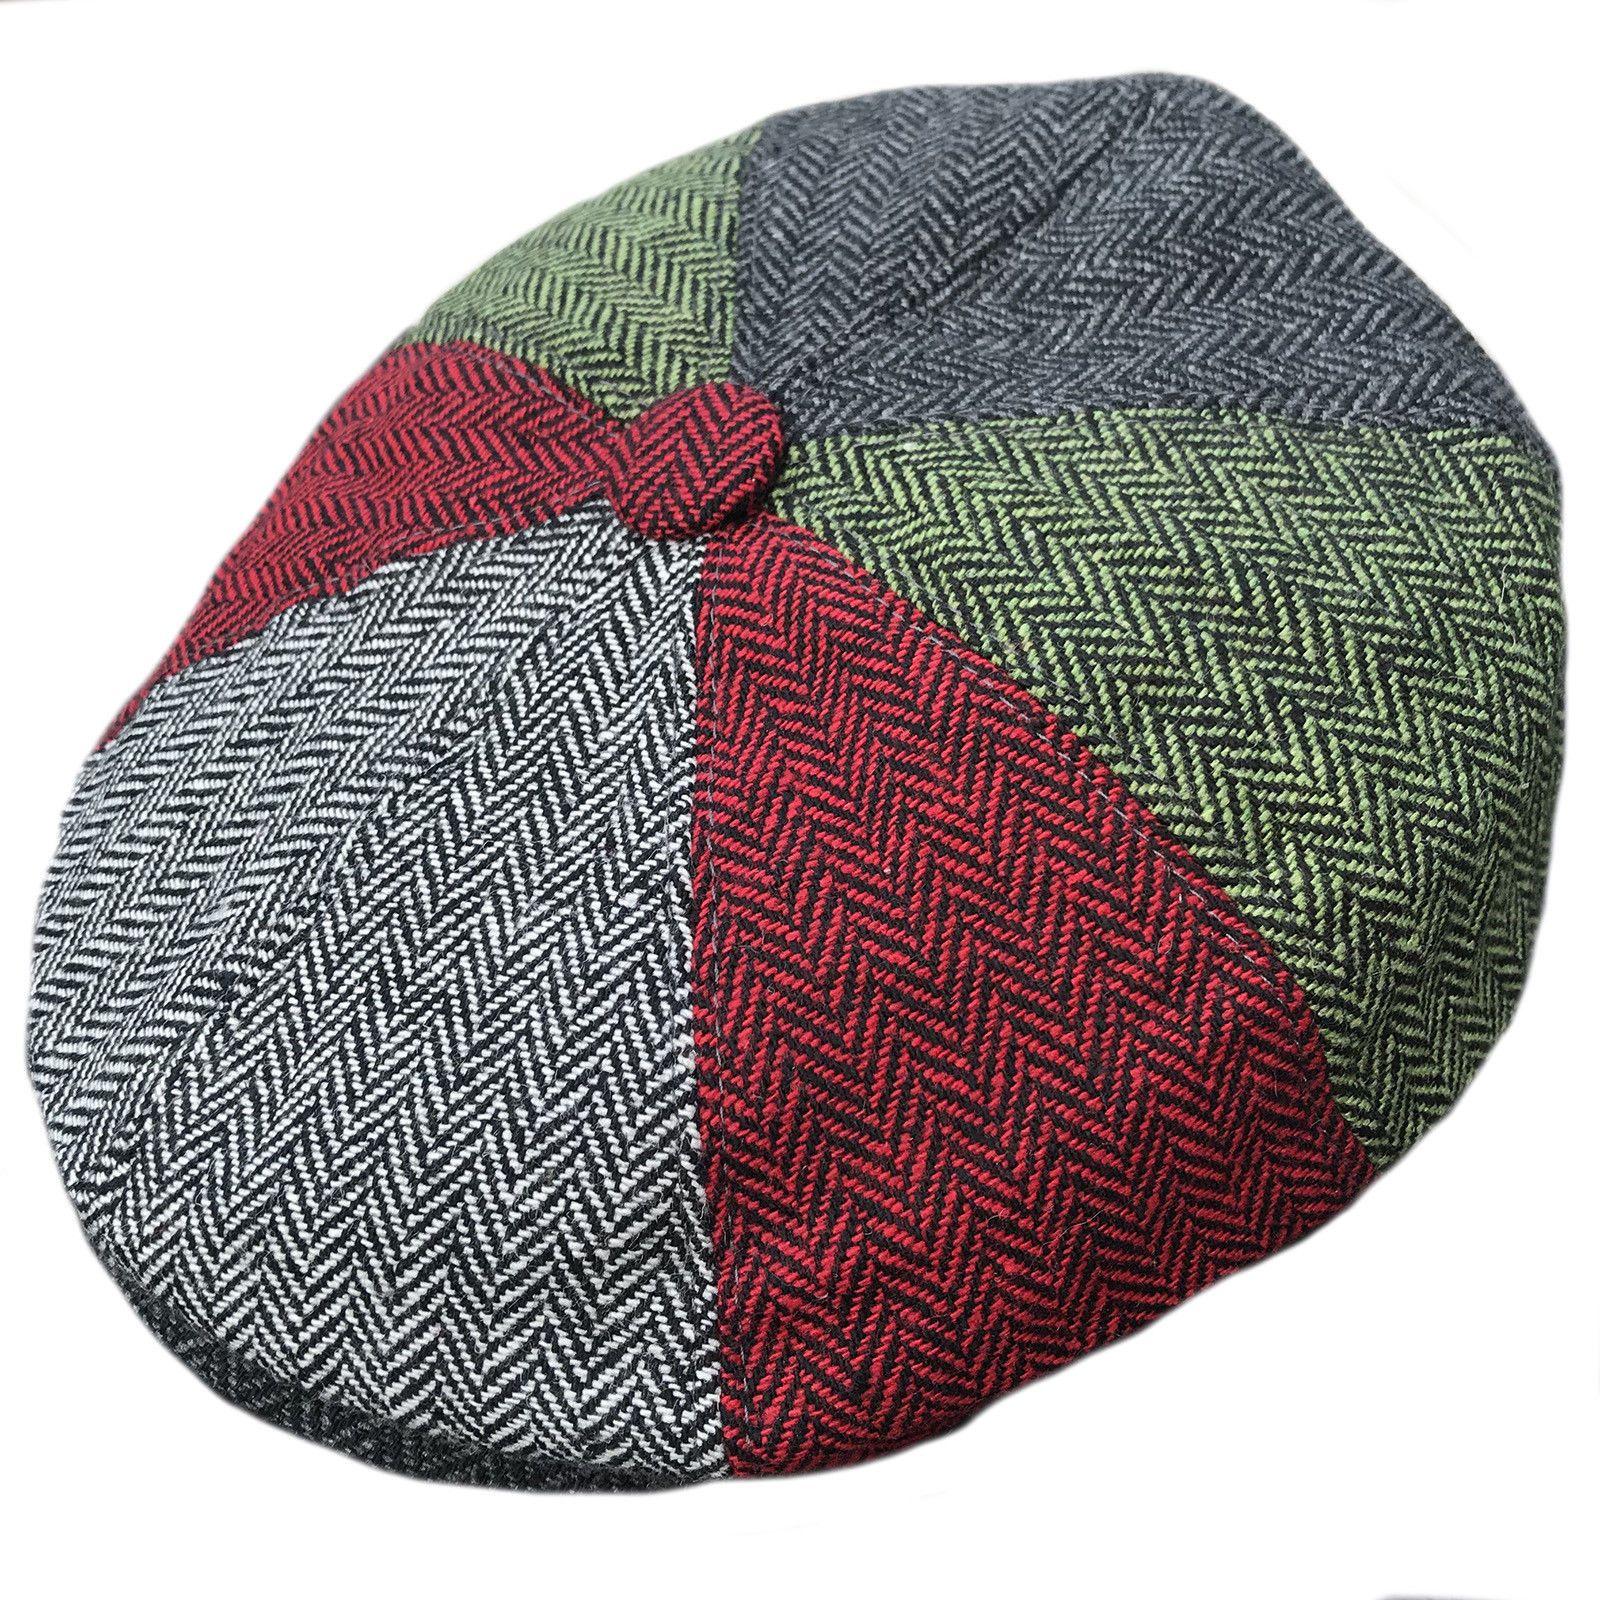 Mens Hats 163619  Gandh Multi Patch Herringbone Wool Newsboy 8 Panel Peaky  Blinders Style Flat Cap -  BUY IT NOW ONLY   14.49 on  eBay  gandh  multi   patch ... 0f66d922cee